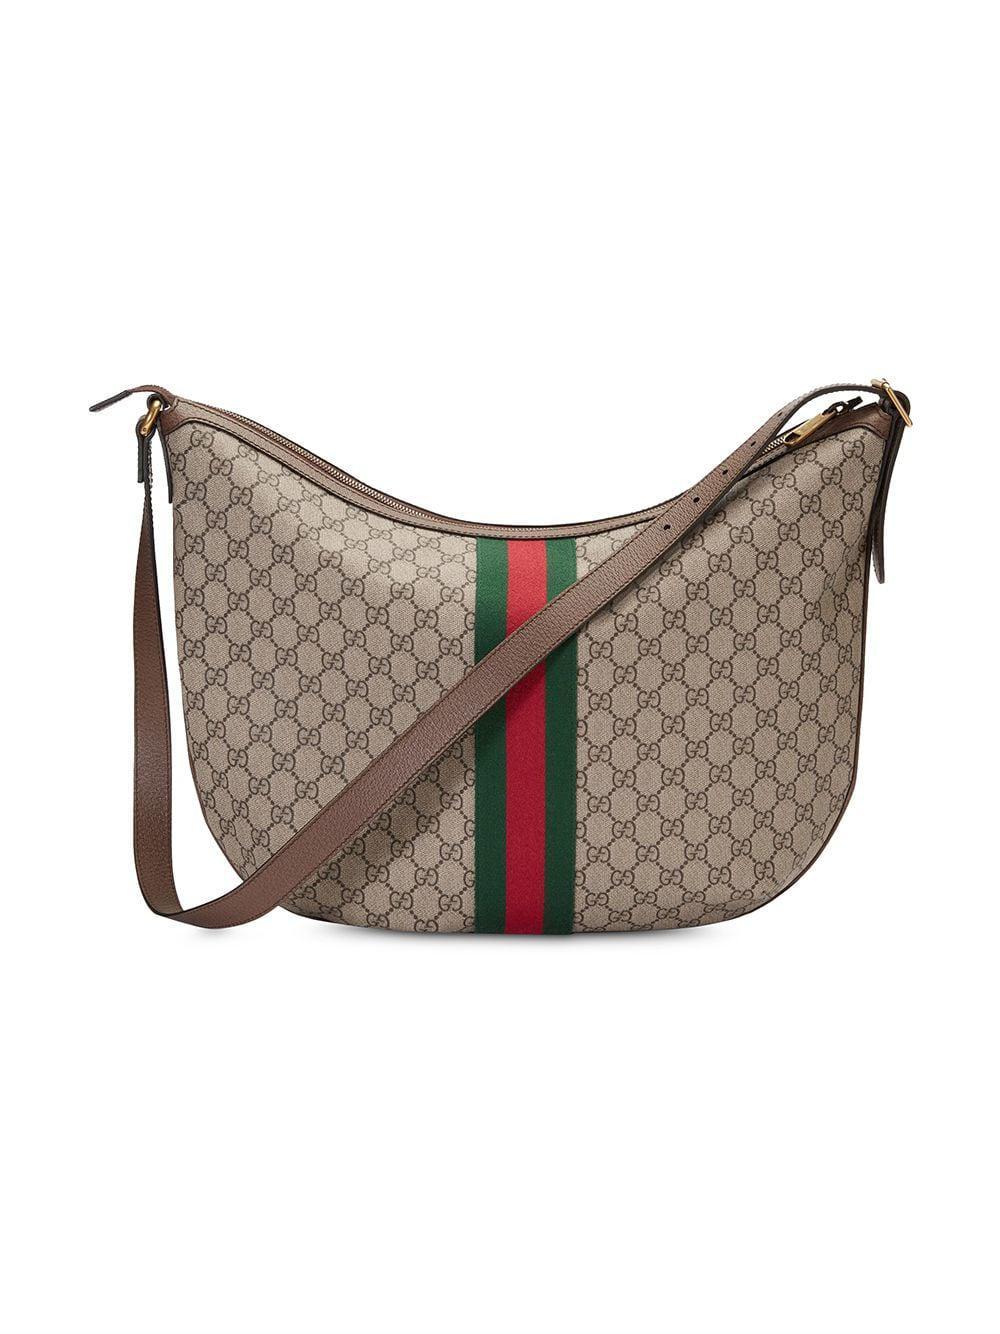 36e6e03a007 Gucci - Brown Ophidia GG Shoulder Bag for Men - Lyst. View fullscreen